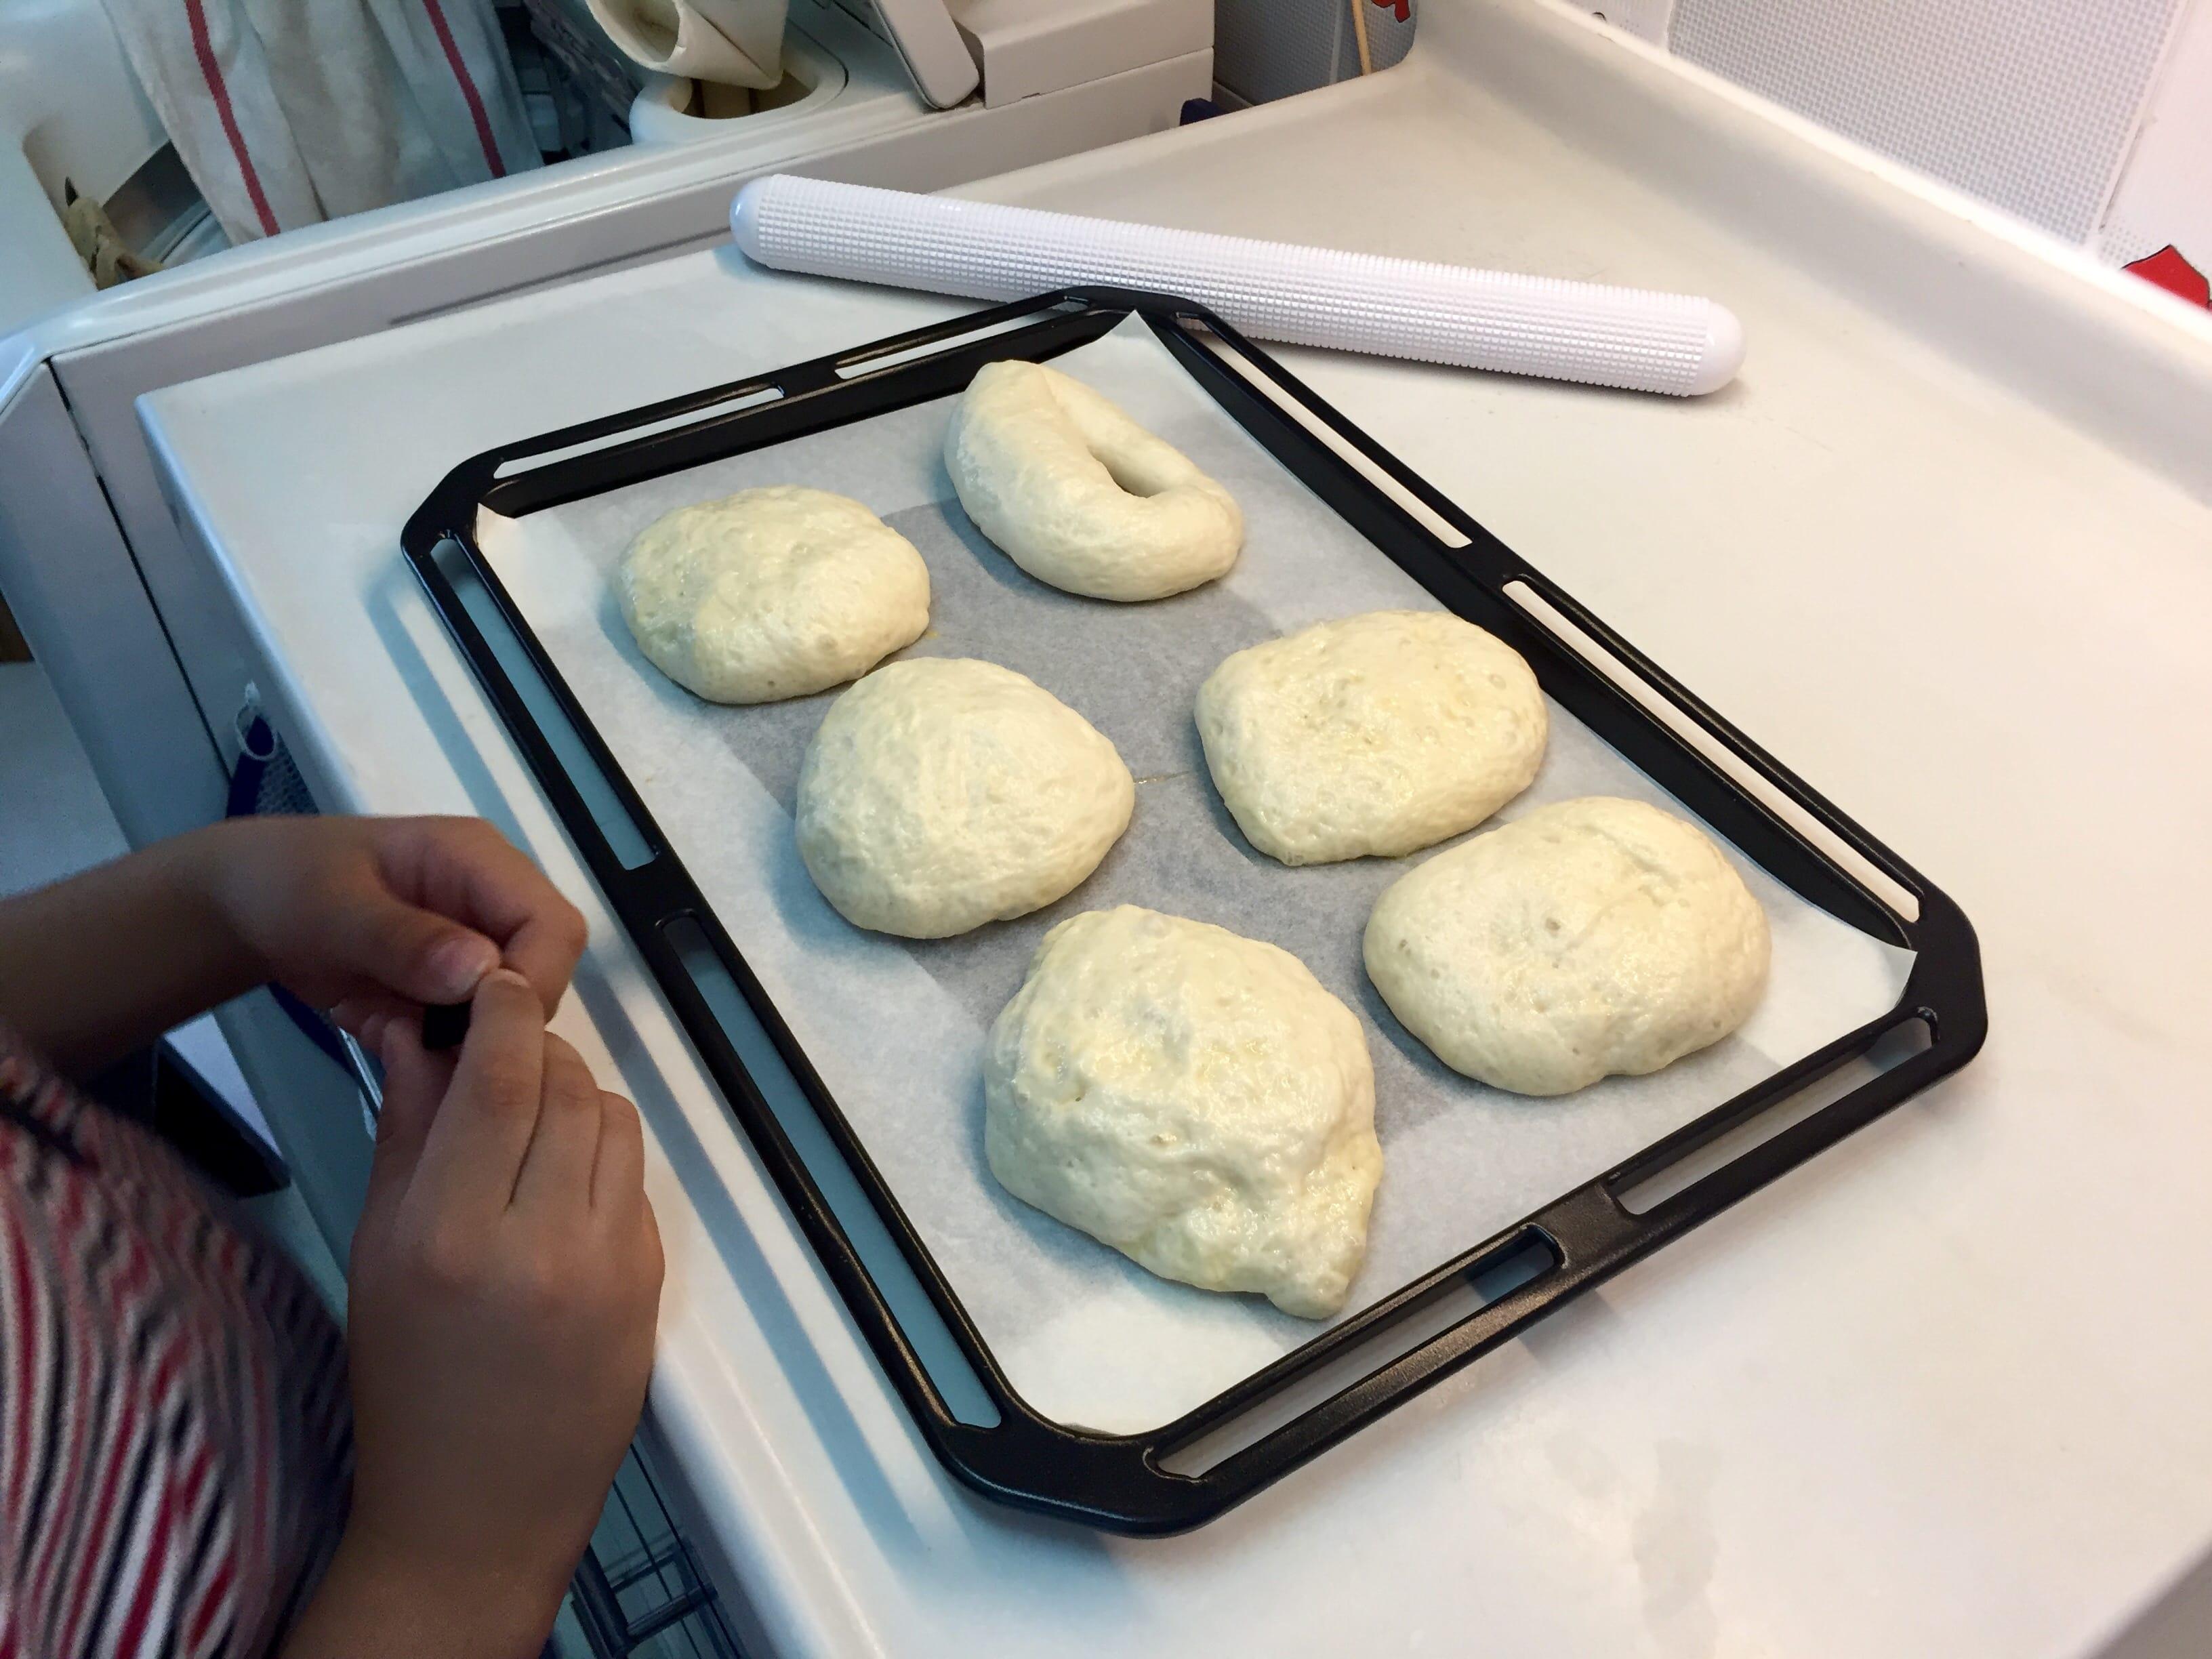 Bread ready for baking